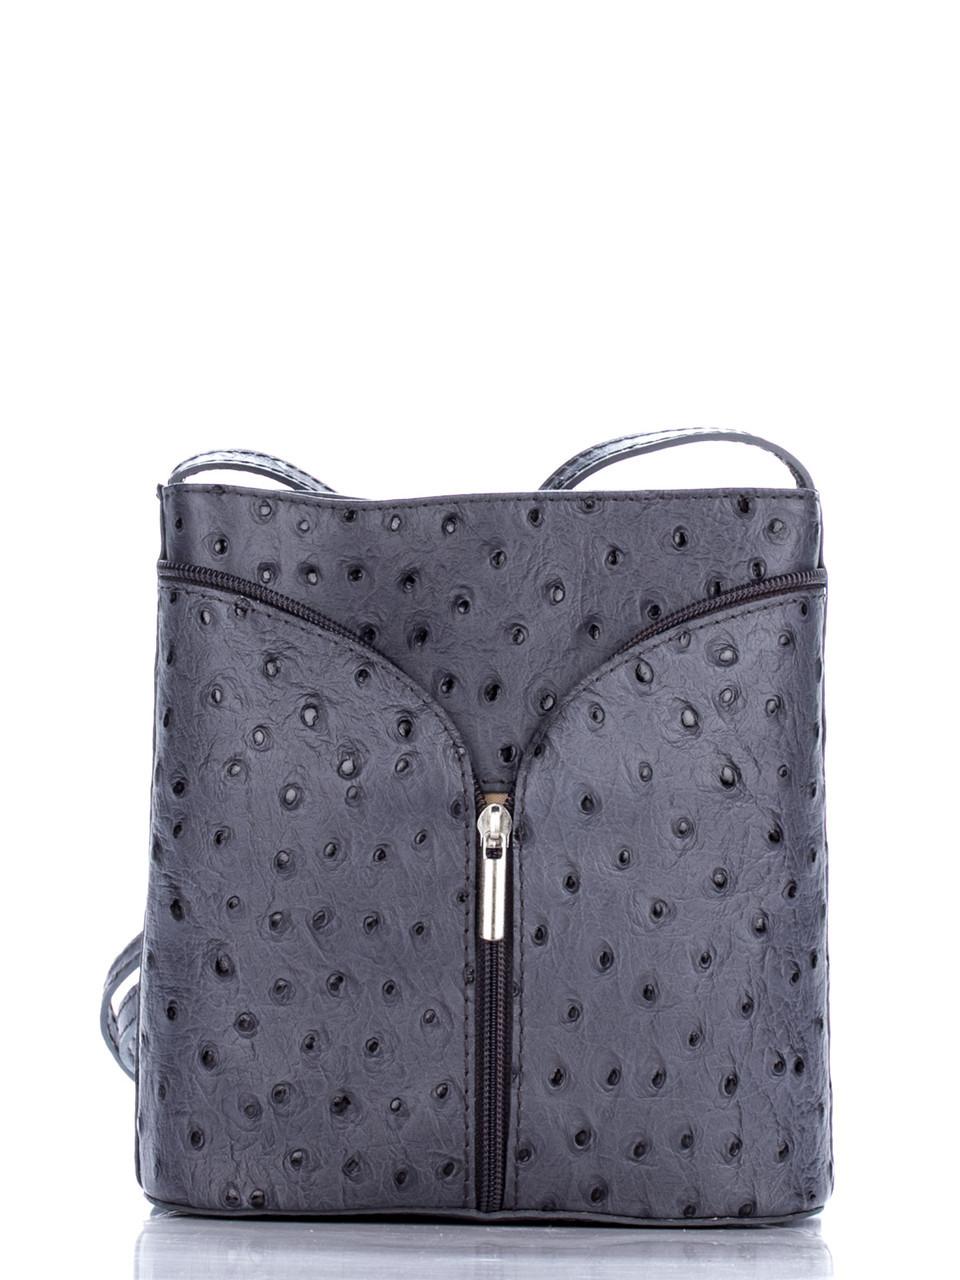 Diva's Bag Женская кожаная сумка KYRA цвет темно-серый